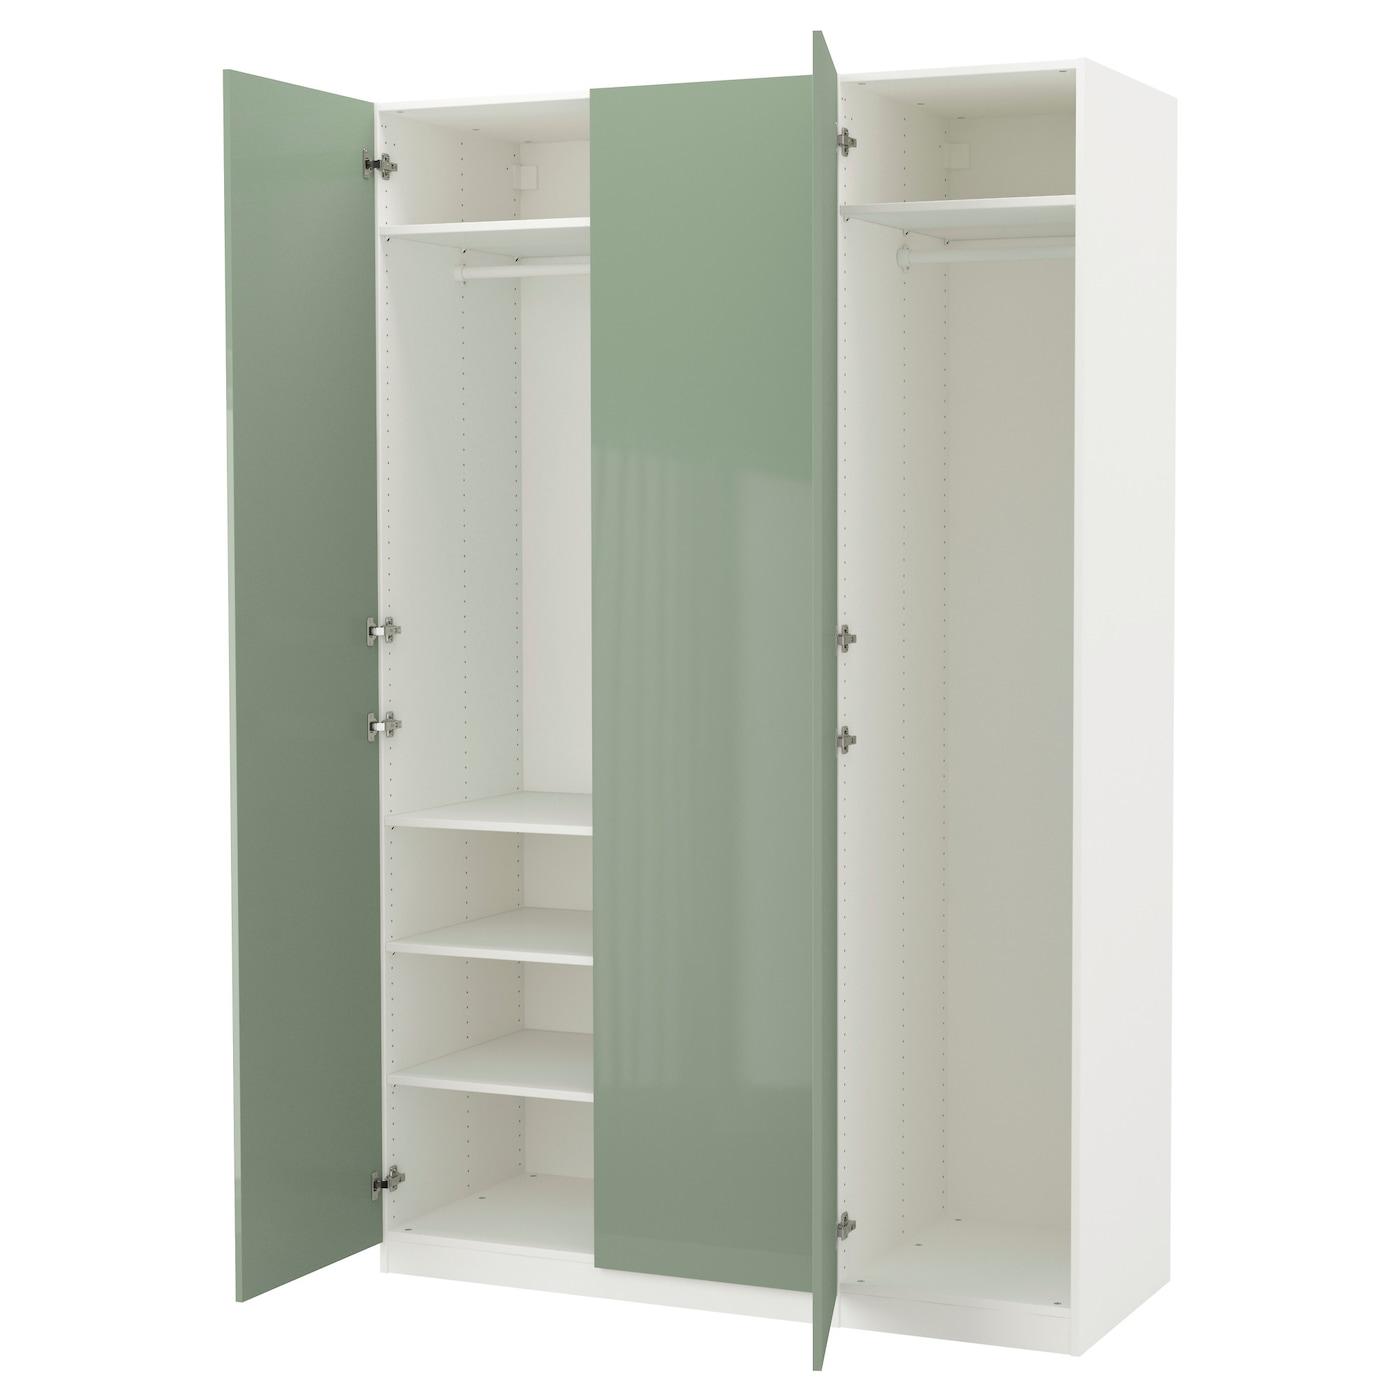 pax armoire penderie blanc fardal brillant vert clair 150x60x236 cm ikea. Black Bedroom Furniture Sets. Home Design Ideas